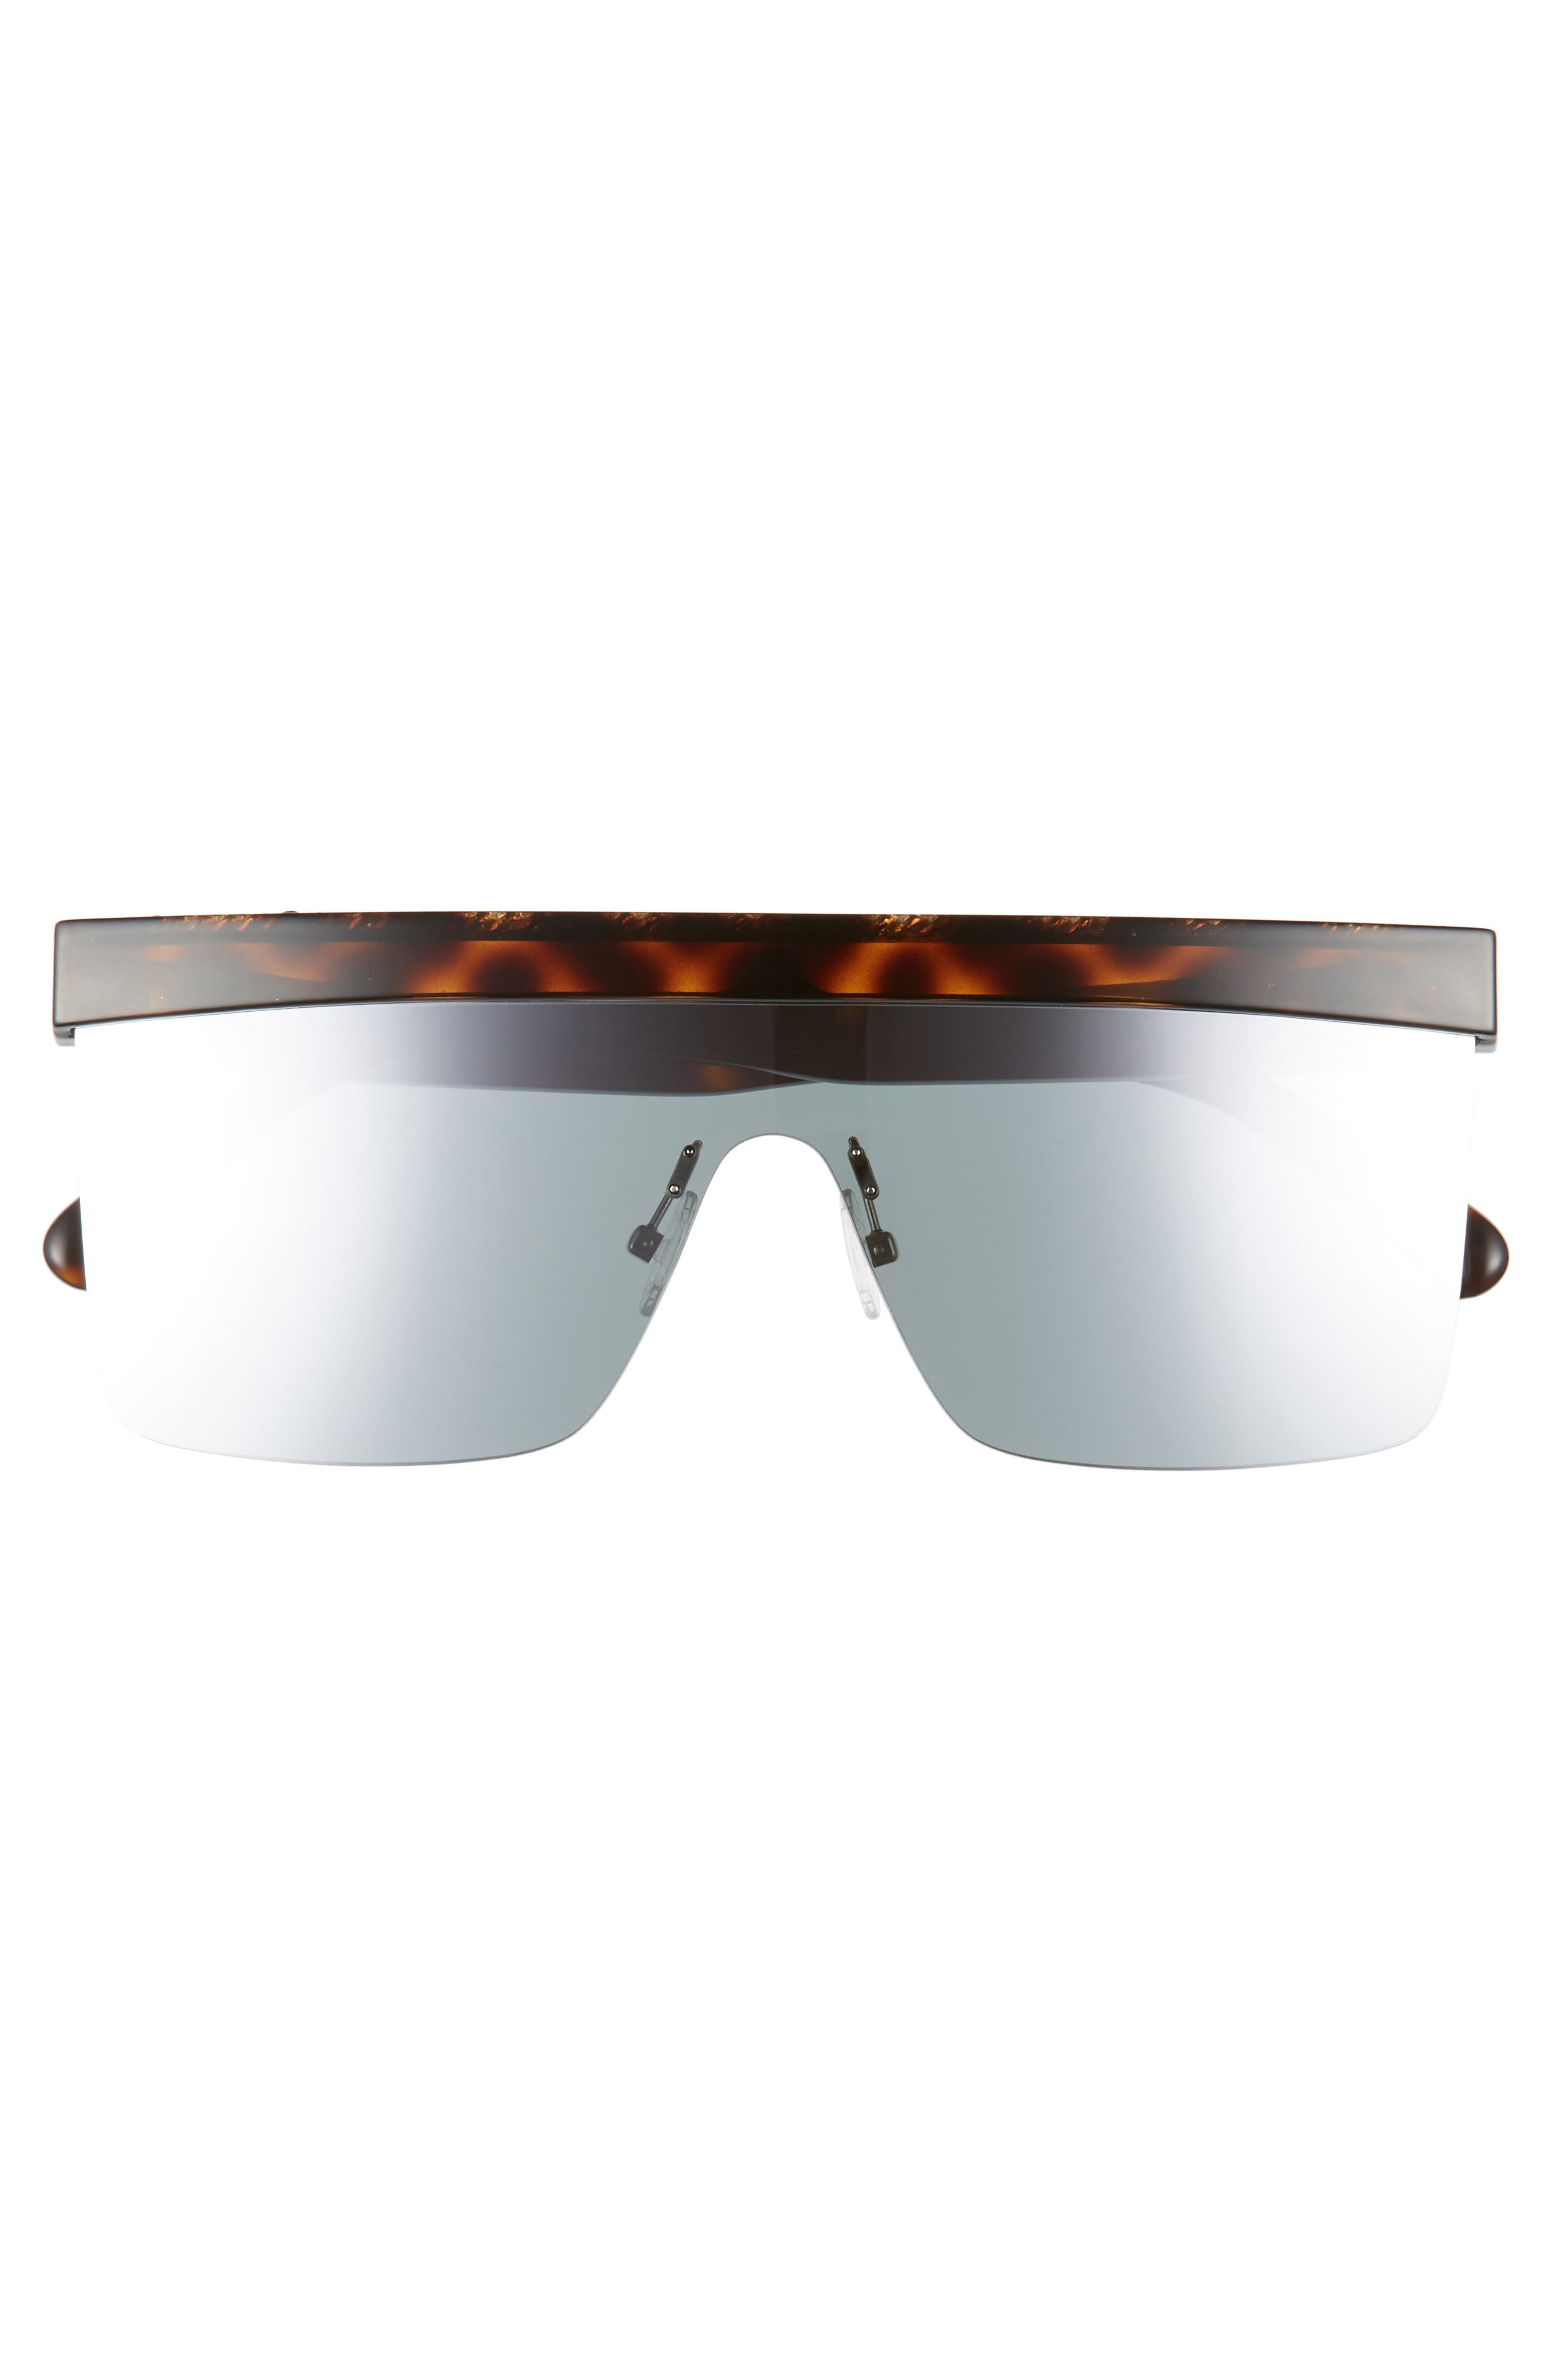 99mm Shield Sunglasses,                             Alternate thumbnail 3, color,                             Shiny Dark Havana